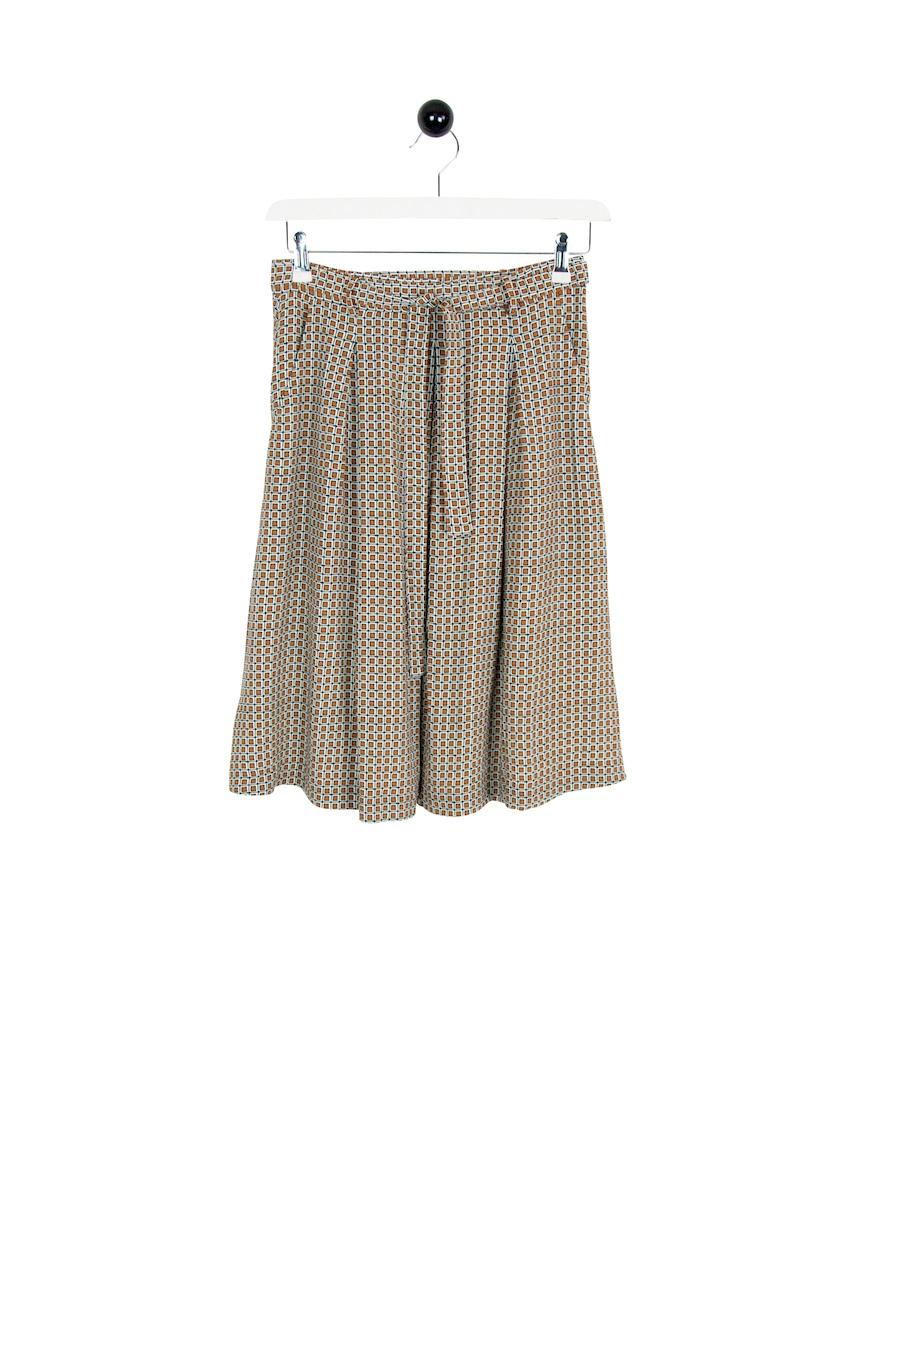 Canne Skirt